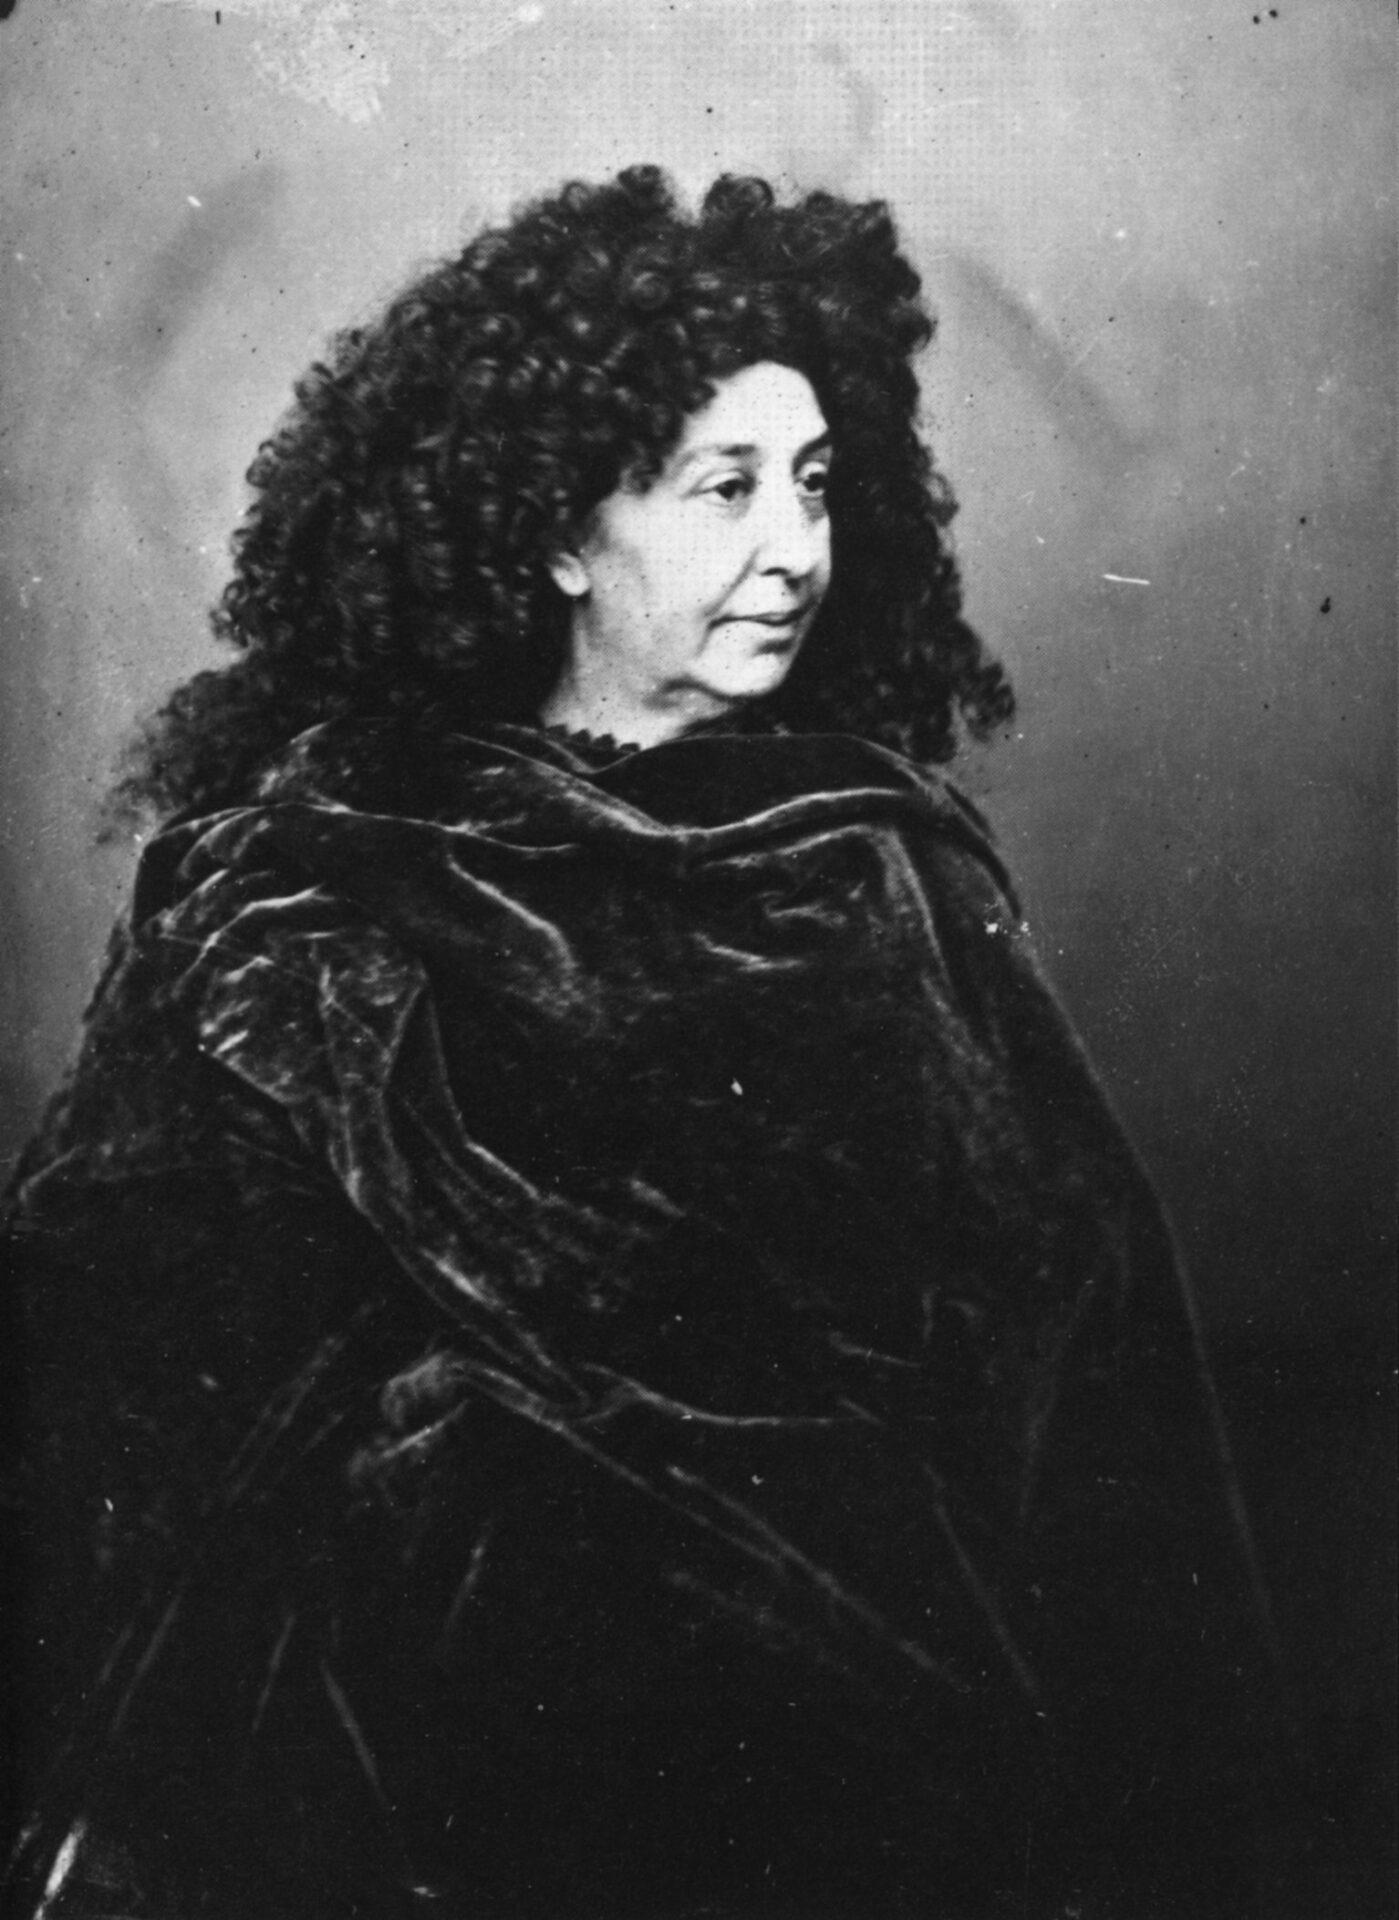 Félix_Nadar_1820-1910_portraits_George_Sand